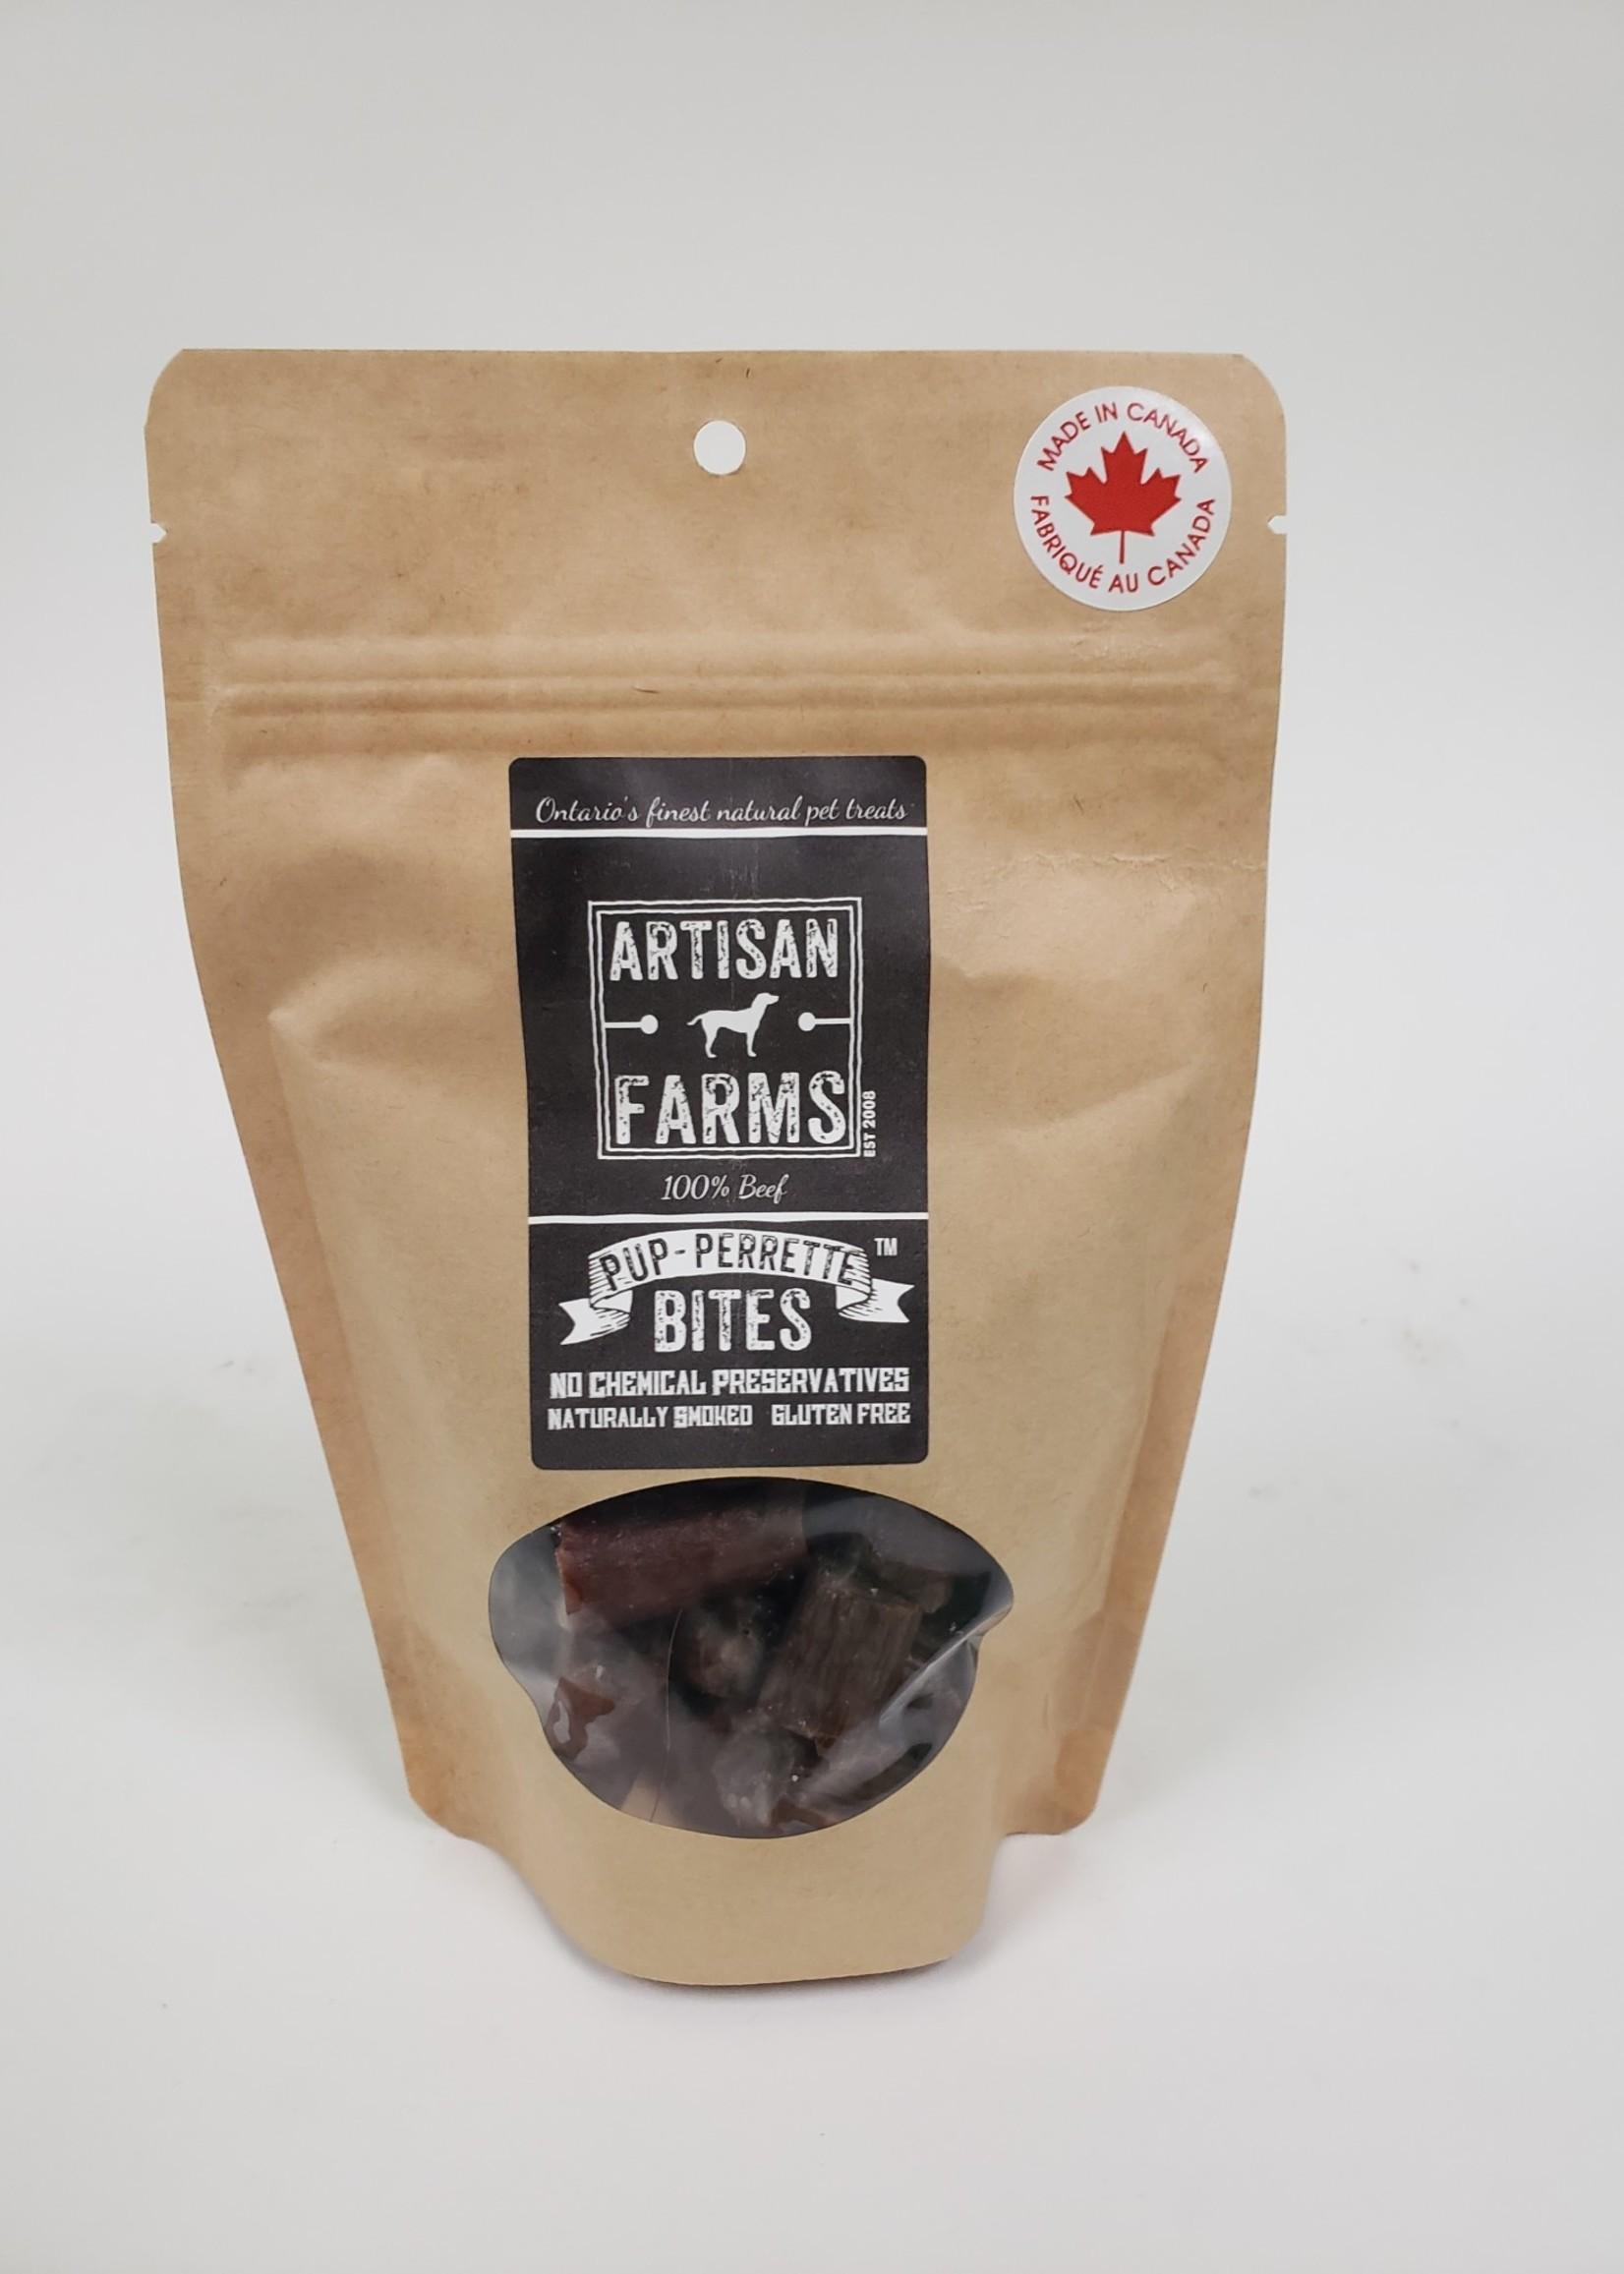 Artisan Farms® Artisan Farms Pup-Perrettes™ Bites 130g